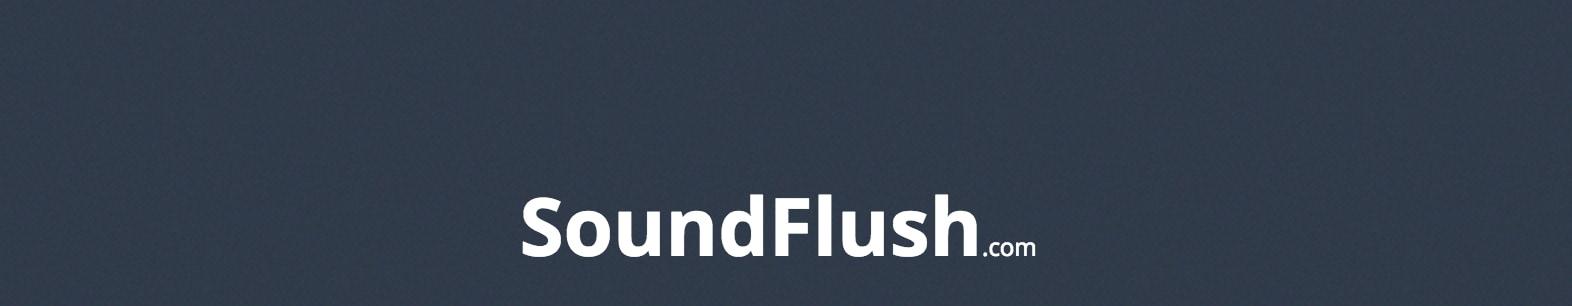 Top 5 Soundcloud downloader free download